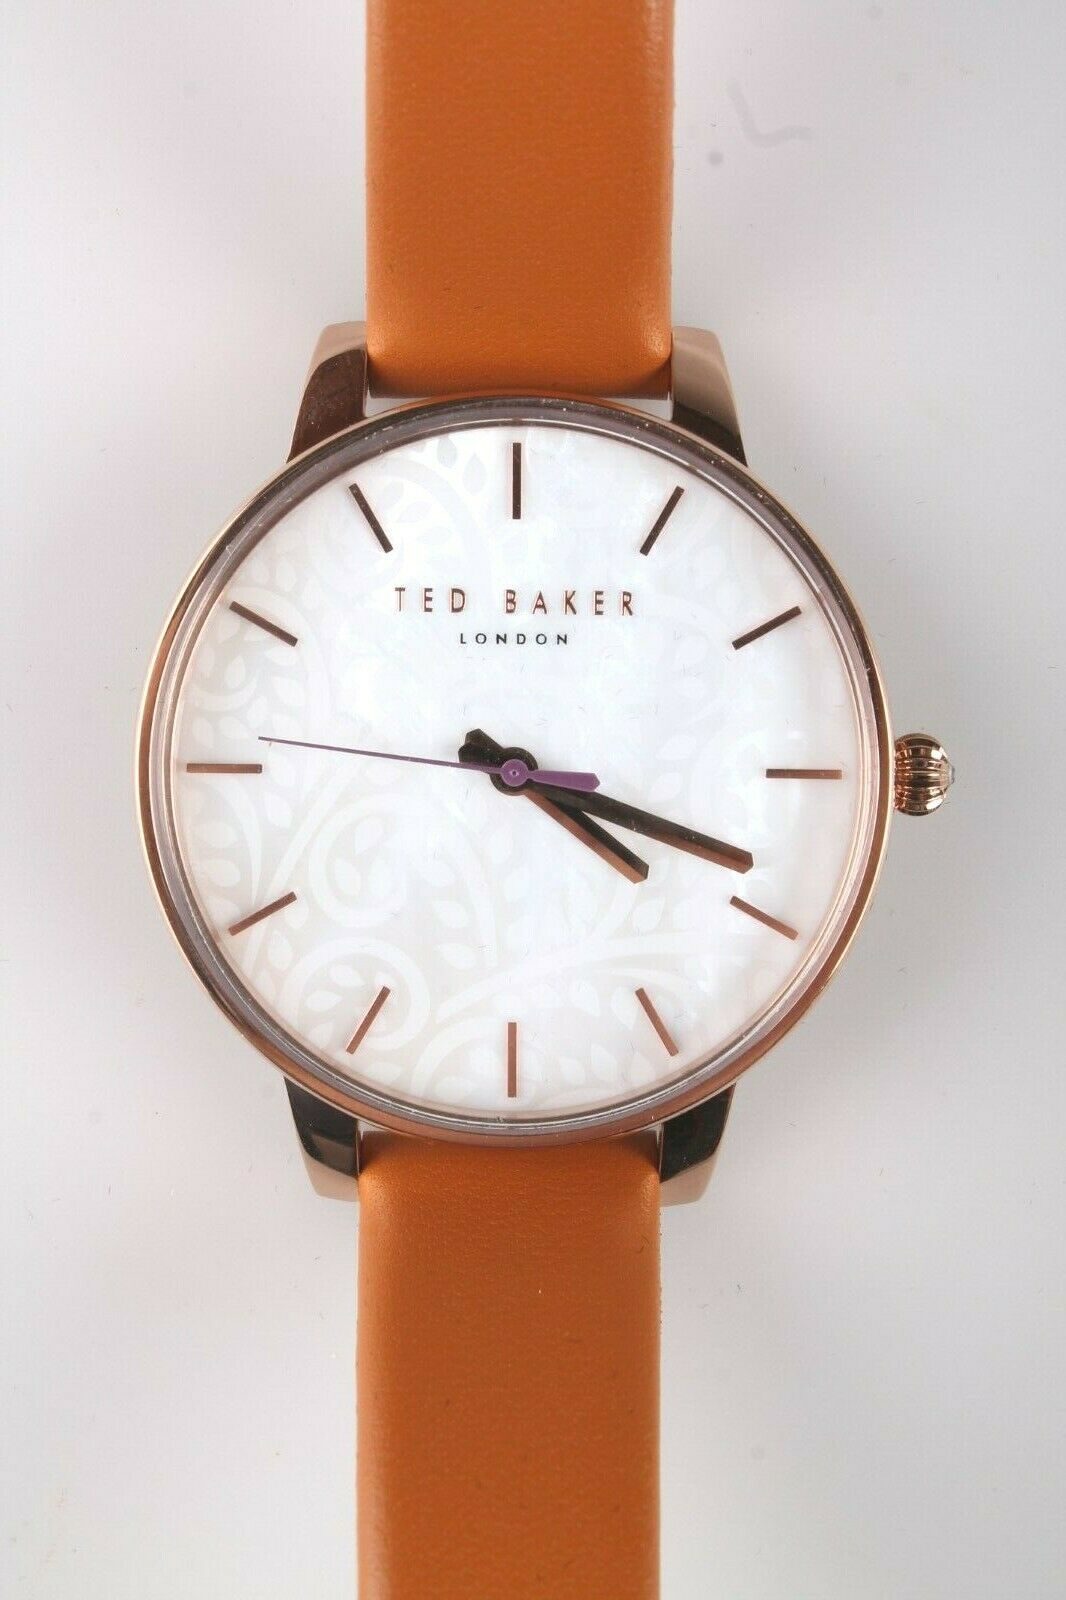 Ted Baker London TE50013007 Hellbraun Echtleder Band & Rose-Gold-Tone Uhr Nwt